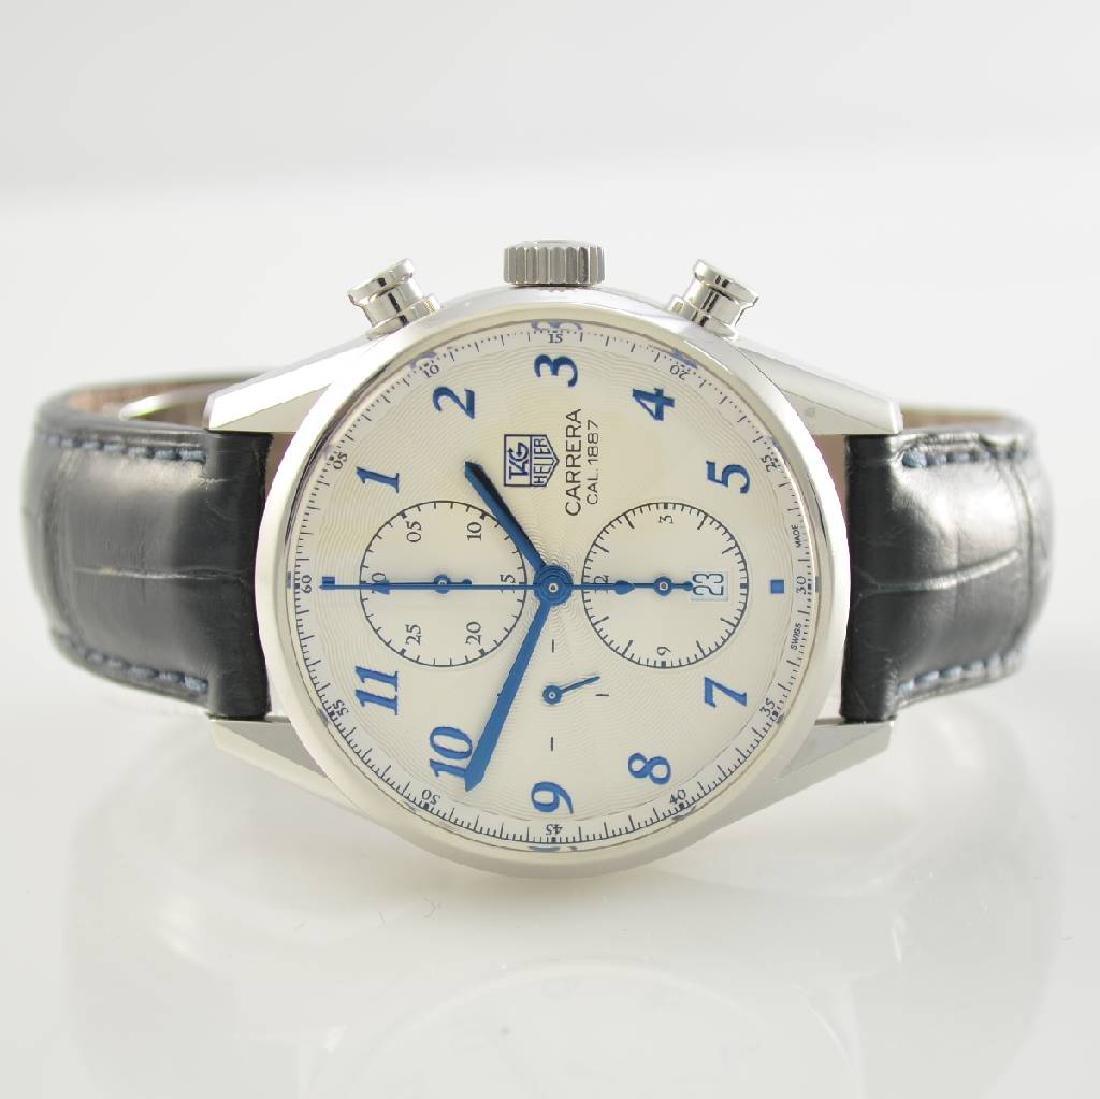 TAG HEUER intermediate wheel chronograph Carrera